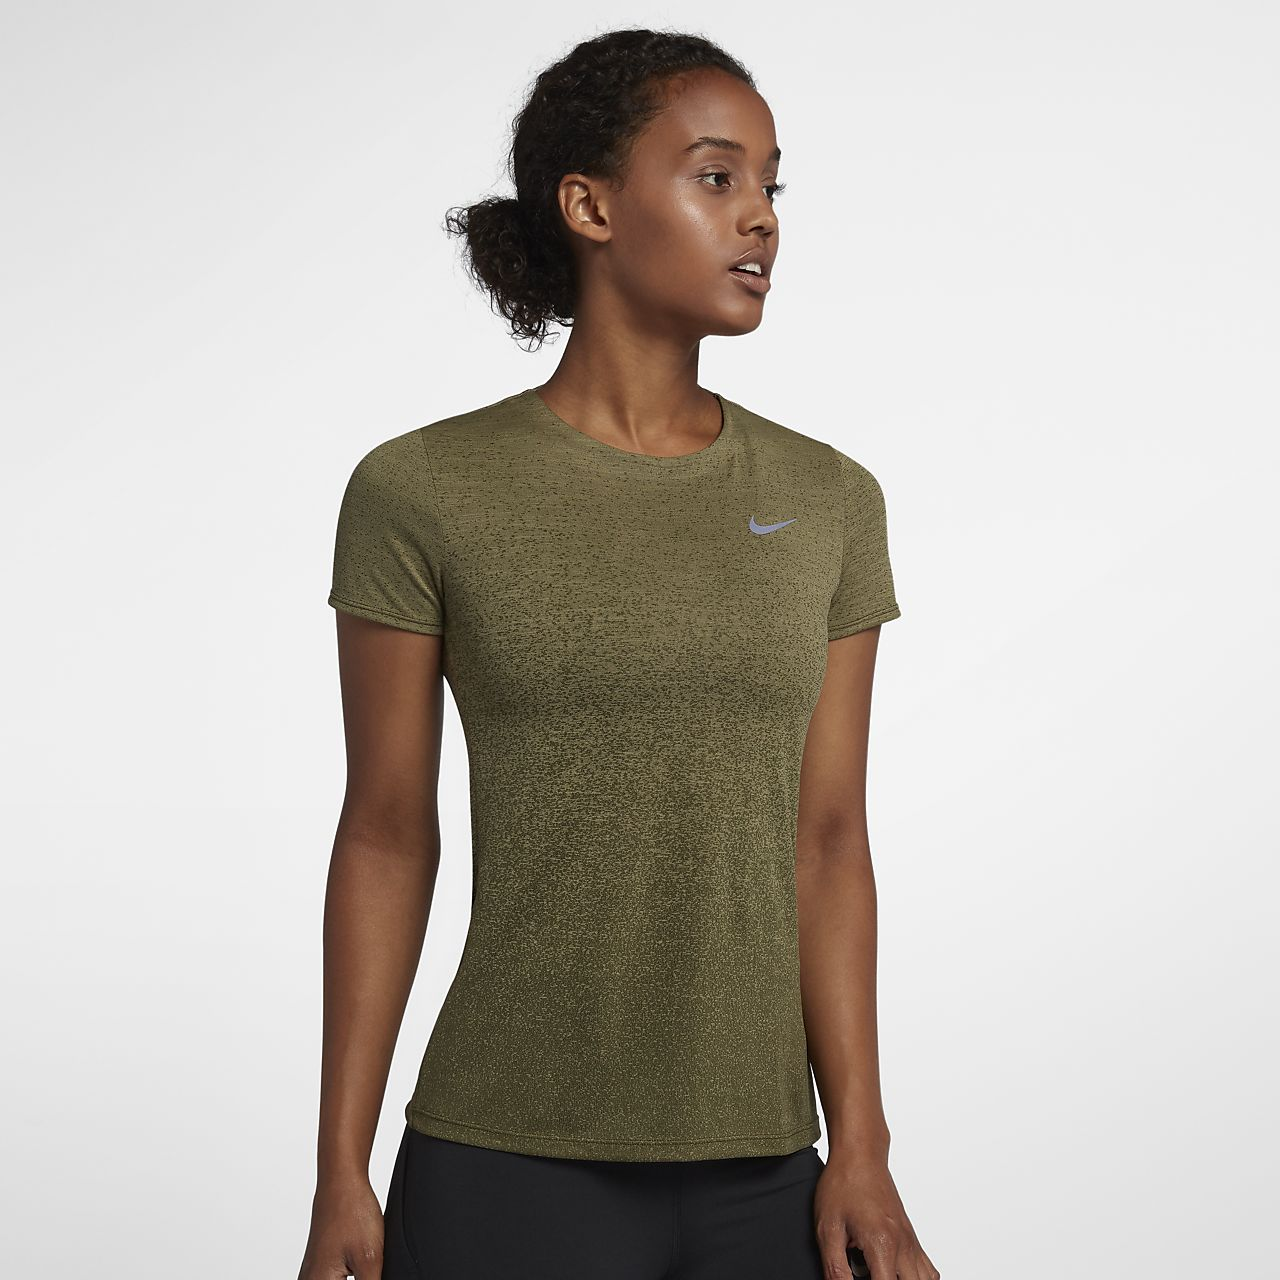 Nike Medalist  Women's Short-Sleeve Running Top